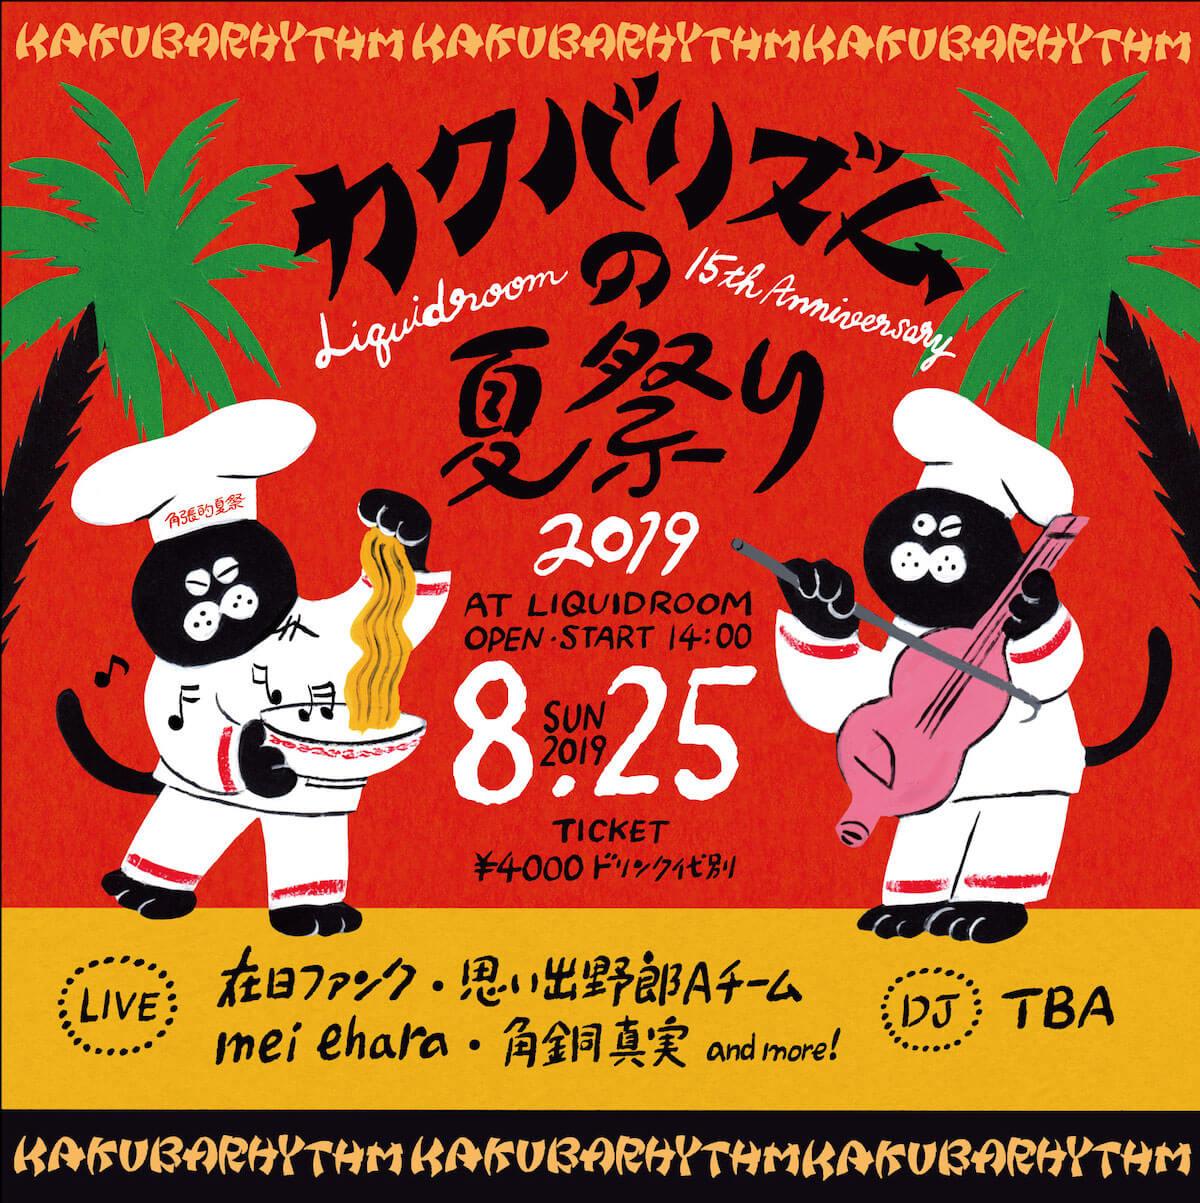 LIQUIDROOMの15周年記念公演「カクバリズムの夏祭り」の出演者が発表に|在日ファンク、思い出野郎Aチーム、mei ehara、角銅真実が登場 music190524-kakubarhythm-3